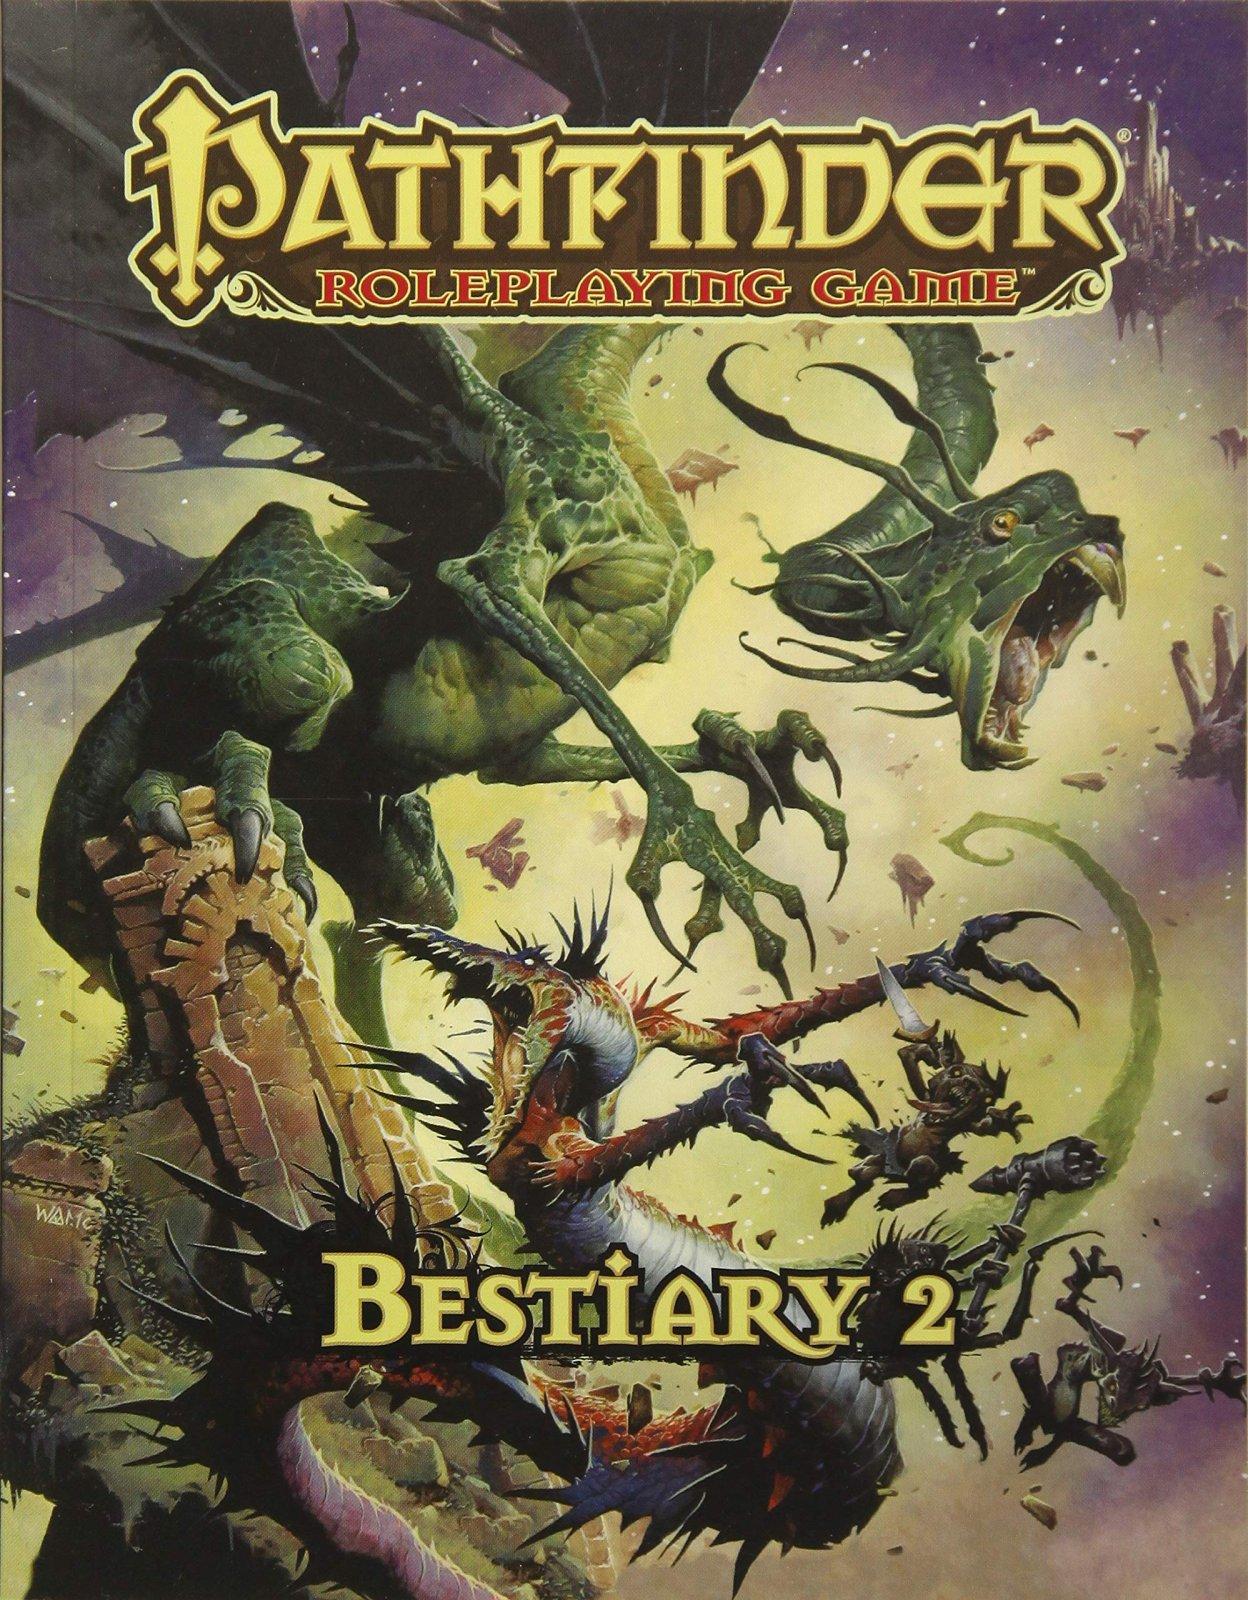 Bestiary 2 - Pathfinder 1ED Hardcover